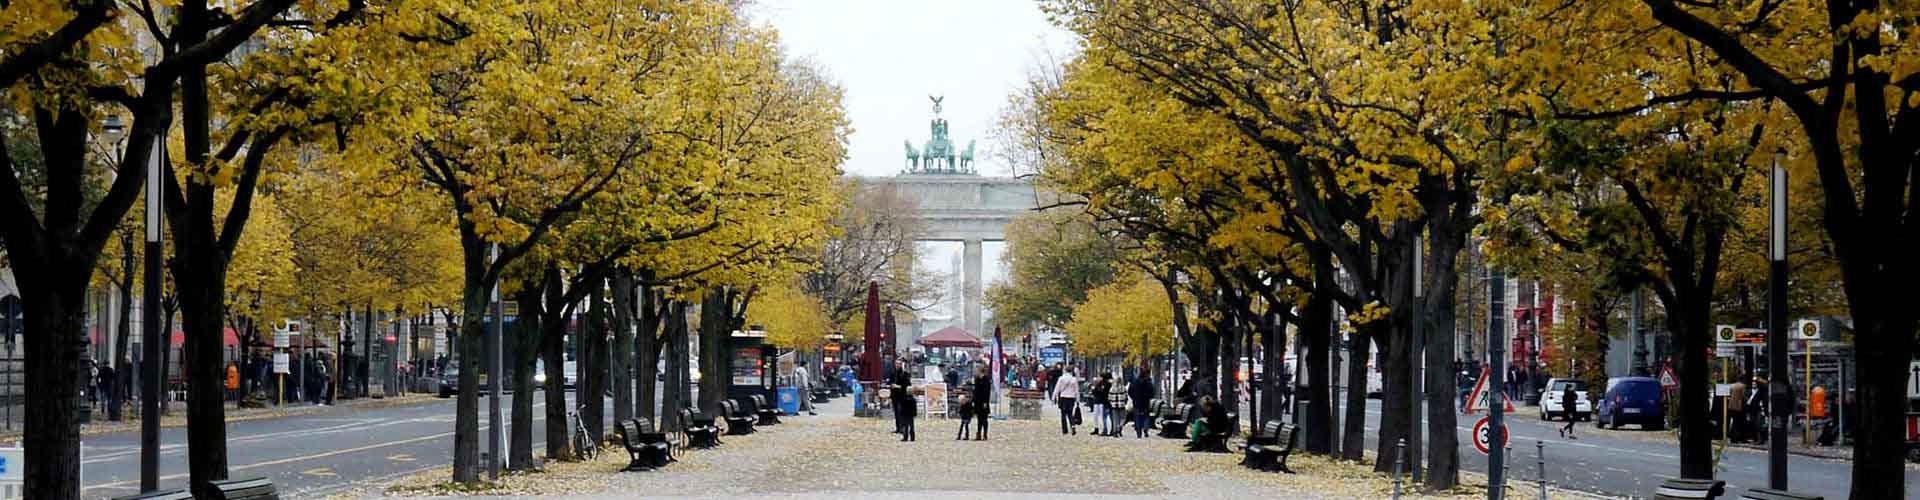 Berlín - Apartamentos cerca a Unter den Linden. Mapas de Berlín, Fotos y comentarios de cada Apartamento en Berlín.